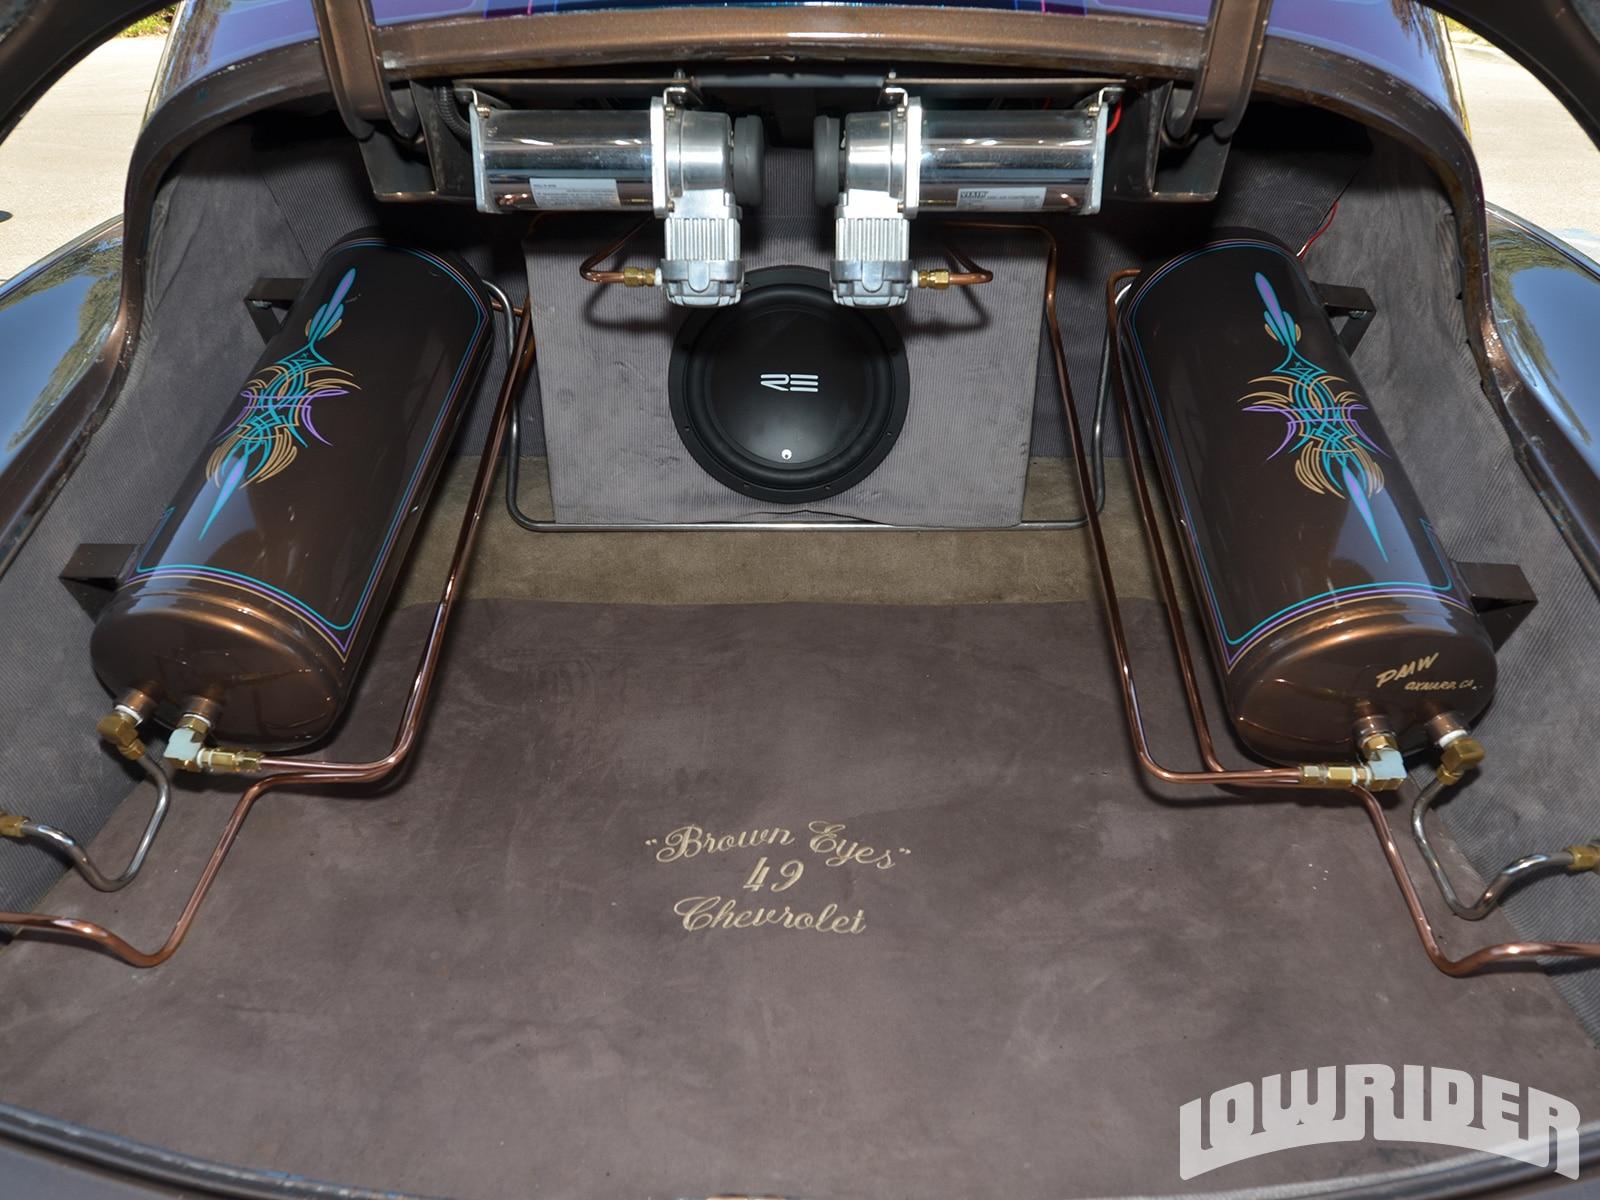 1949 Chevrolet Fleetline - Lowrider Magazine